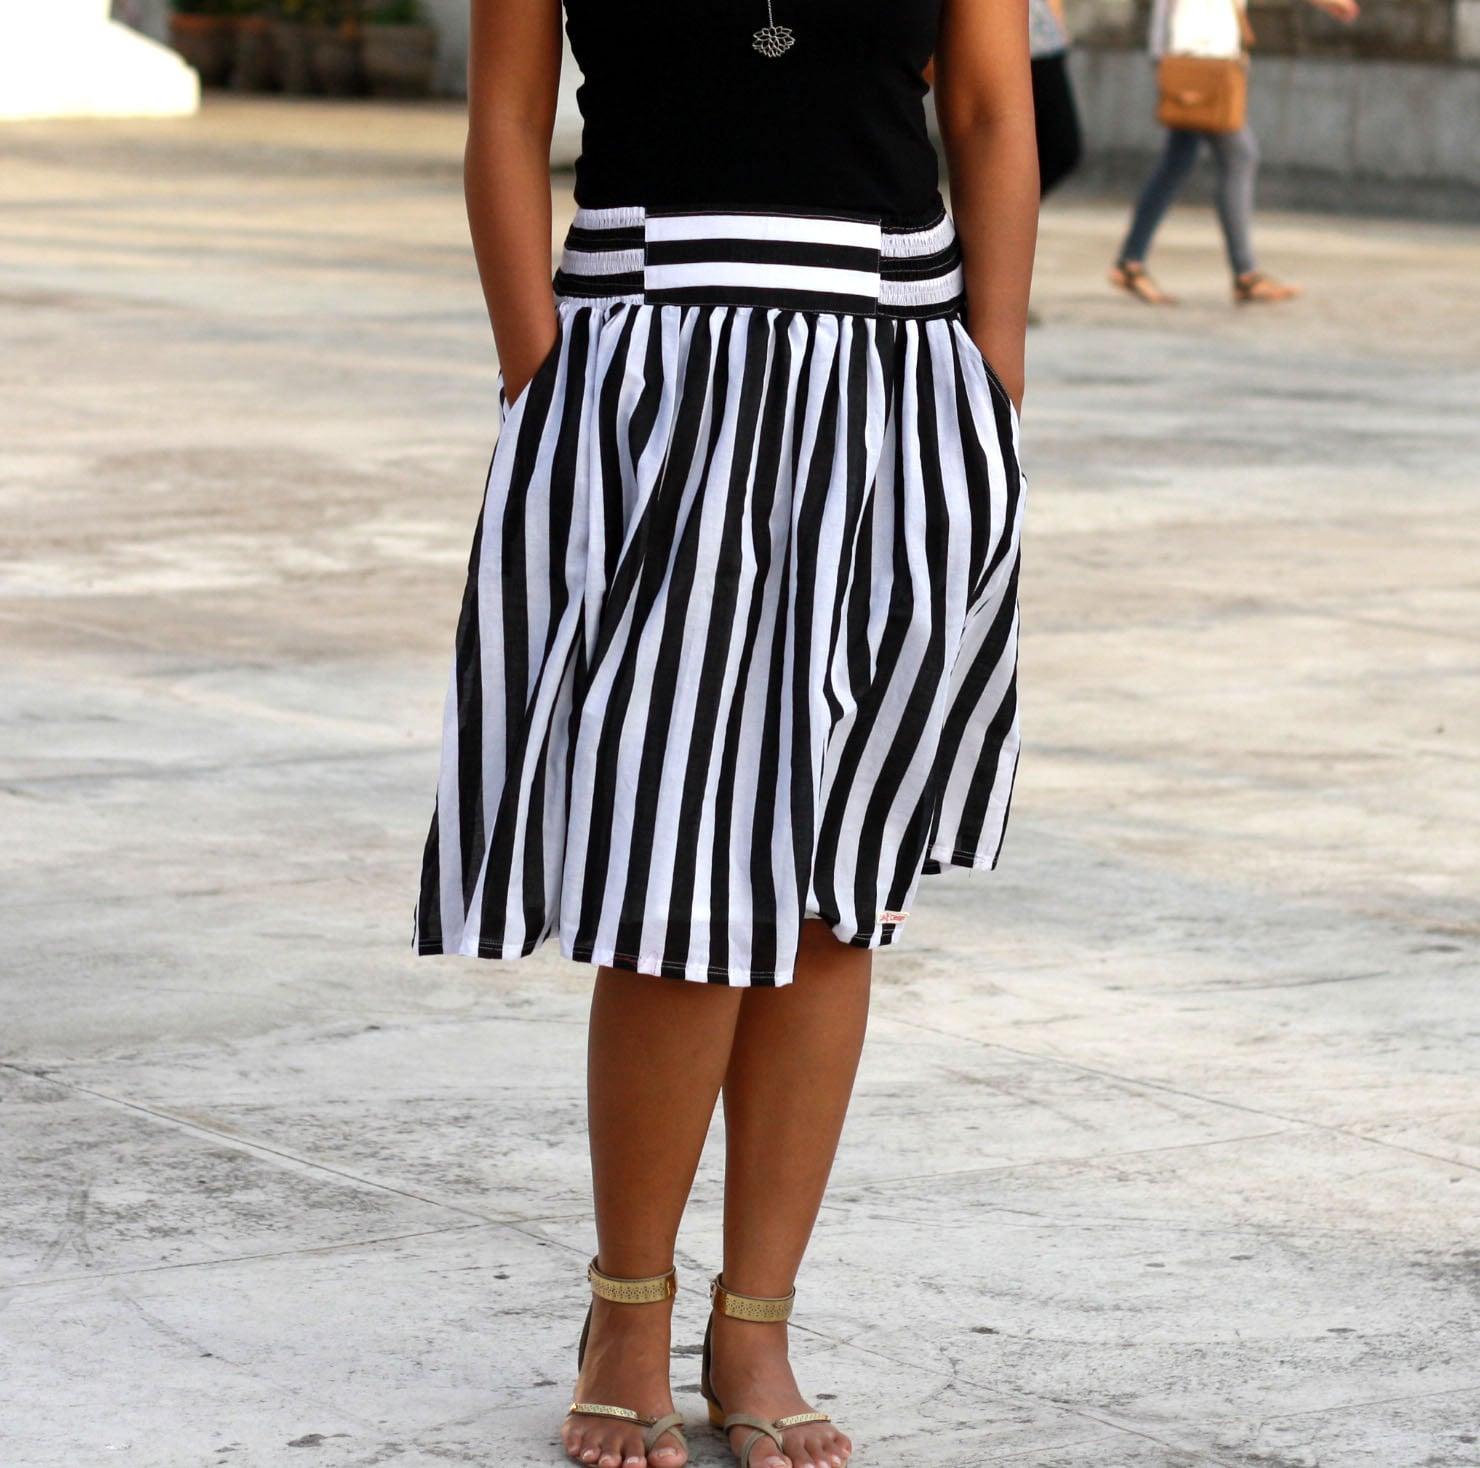 black and white striped skirt midi skirt nautical skirt